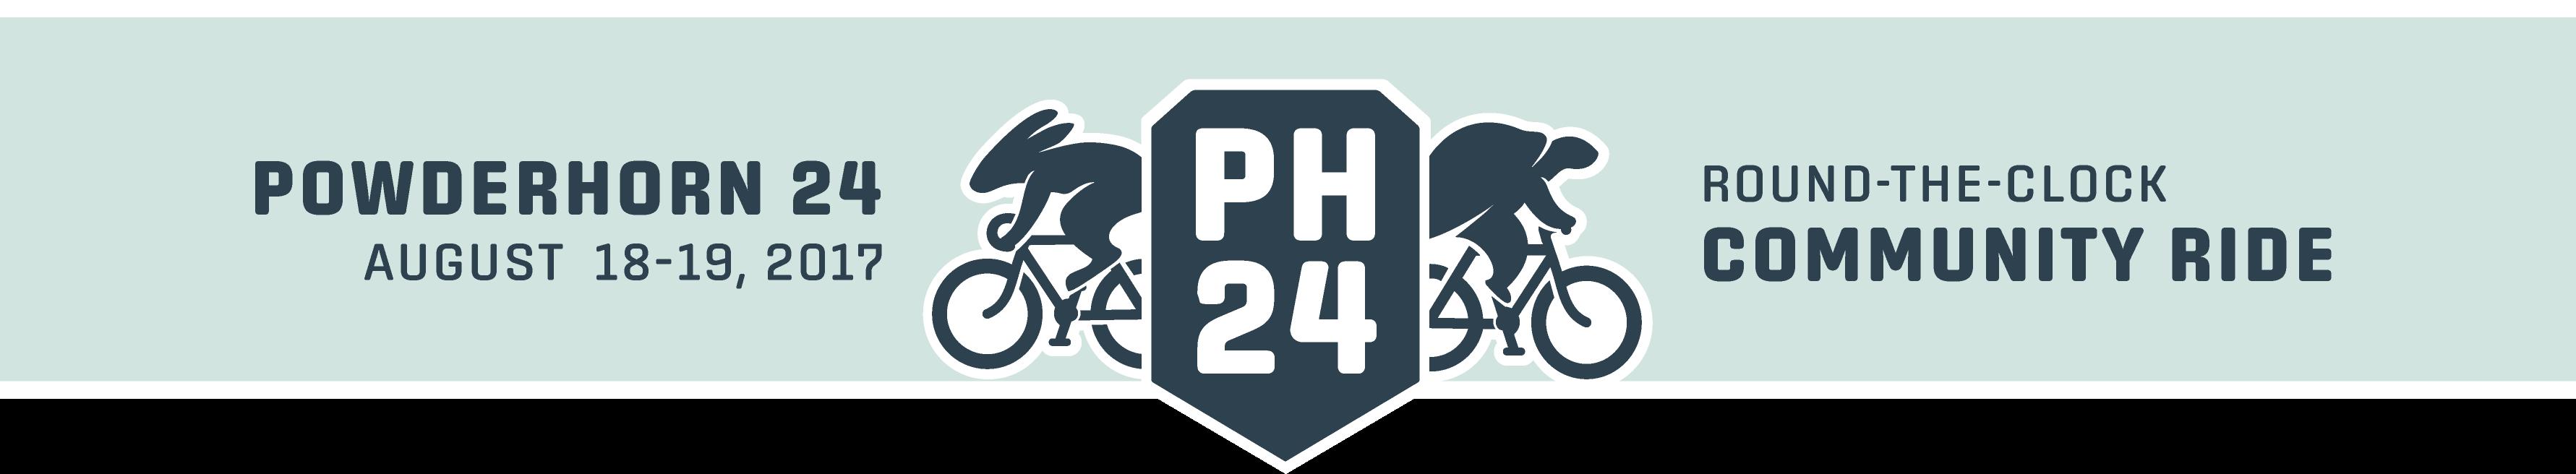 Powderhorn 24 2017 - August 18-19, 2017